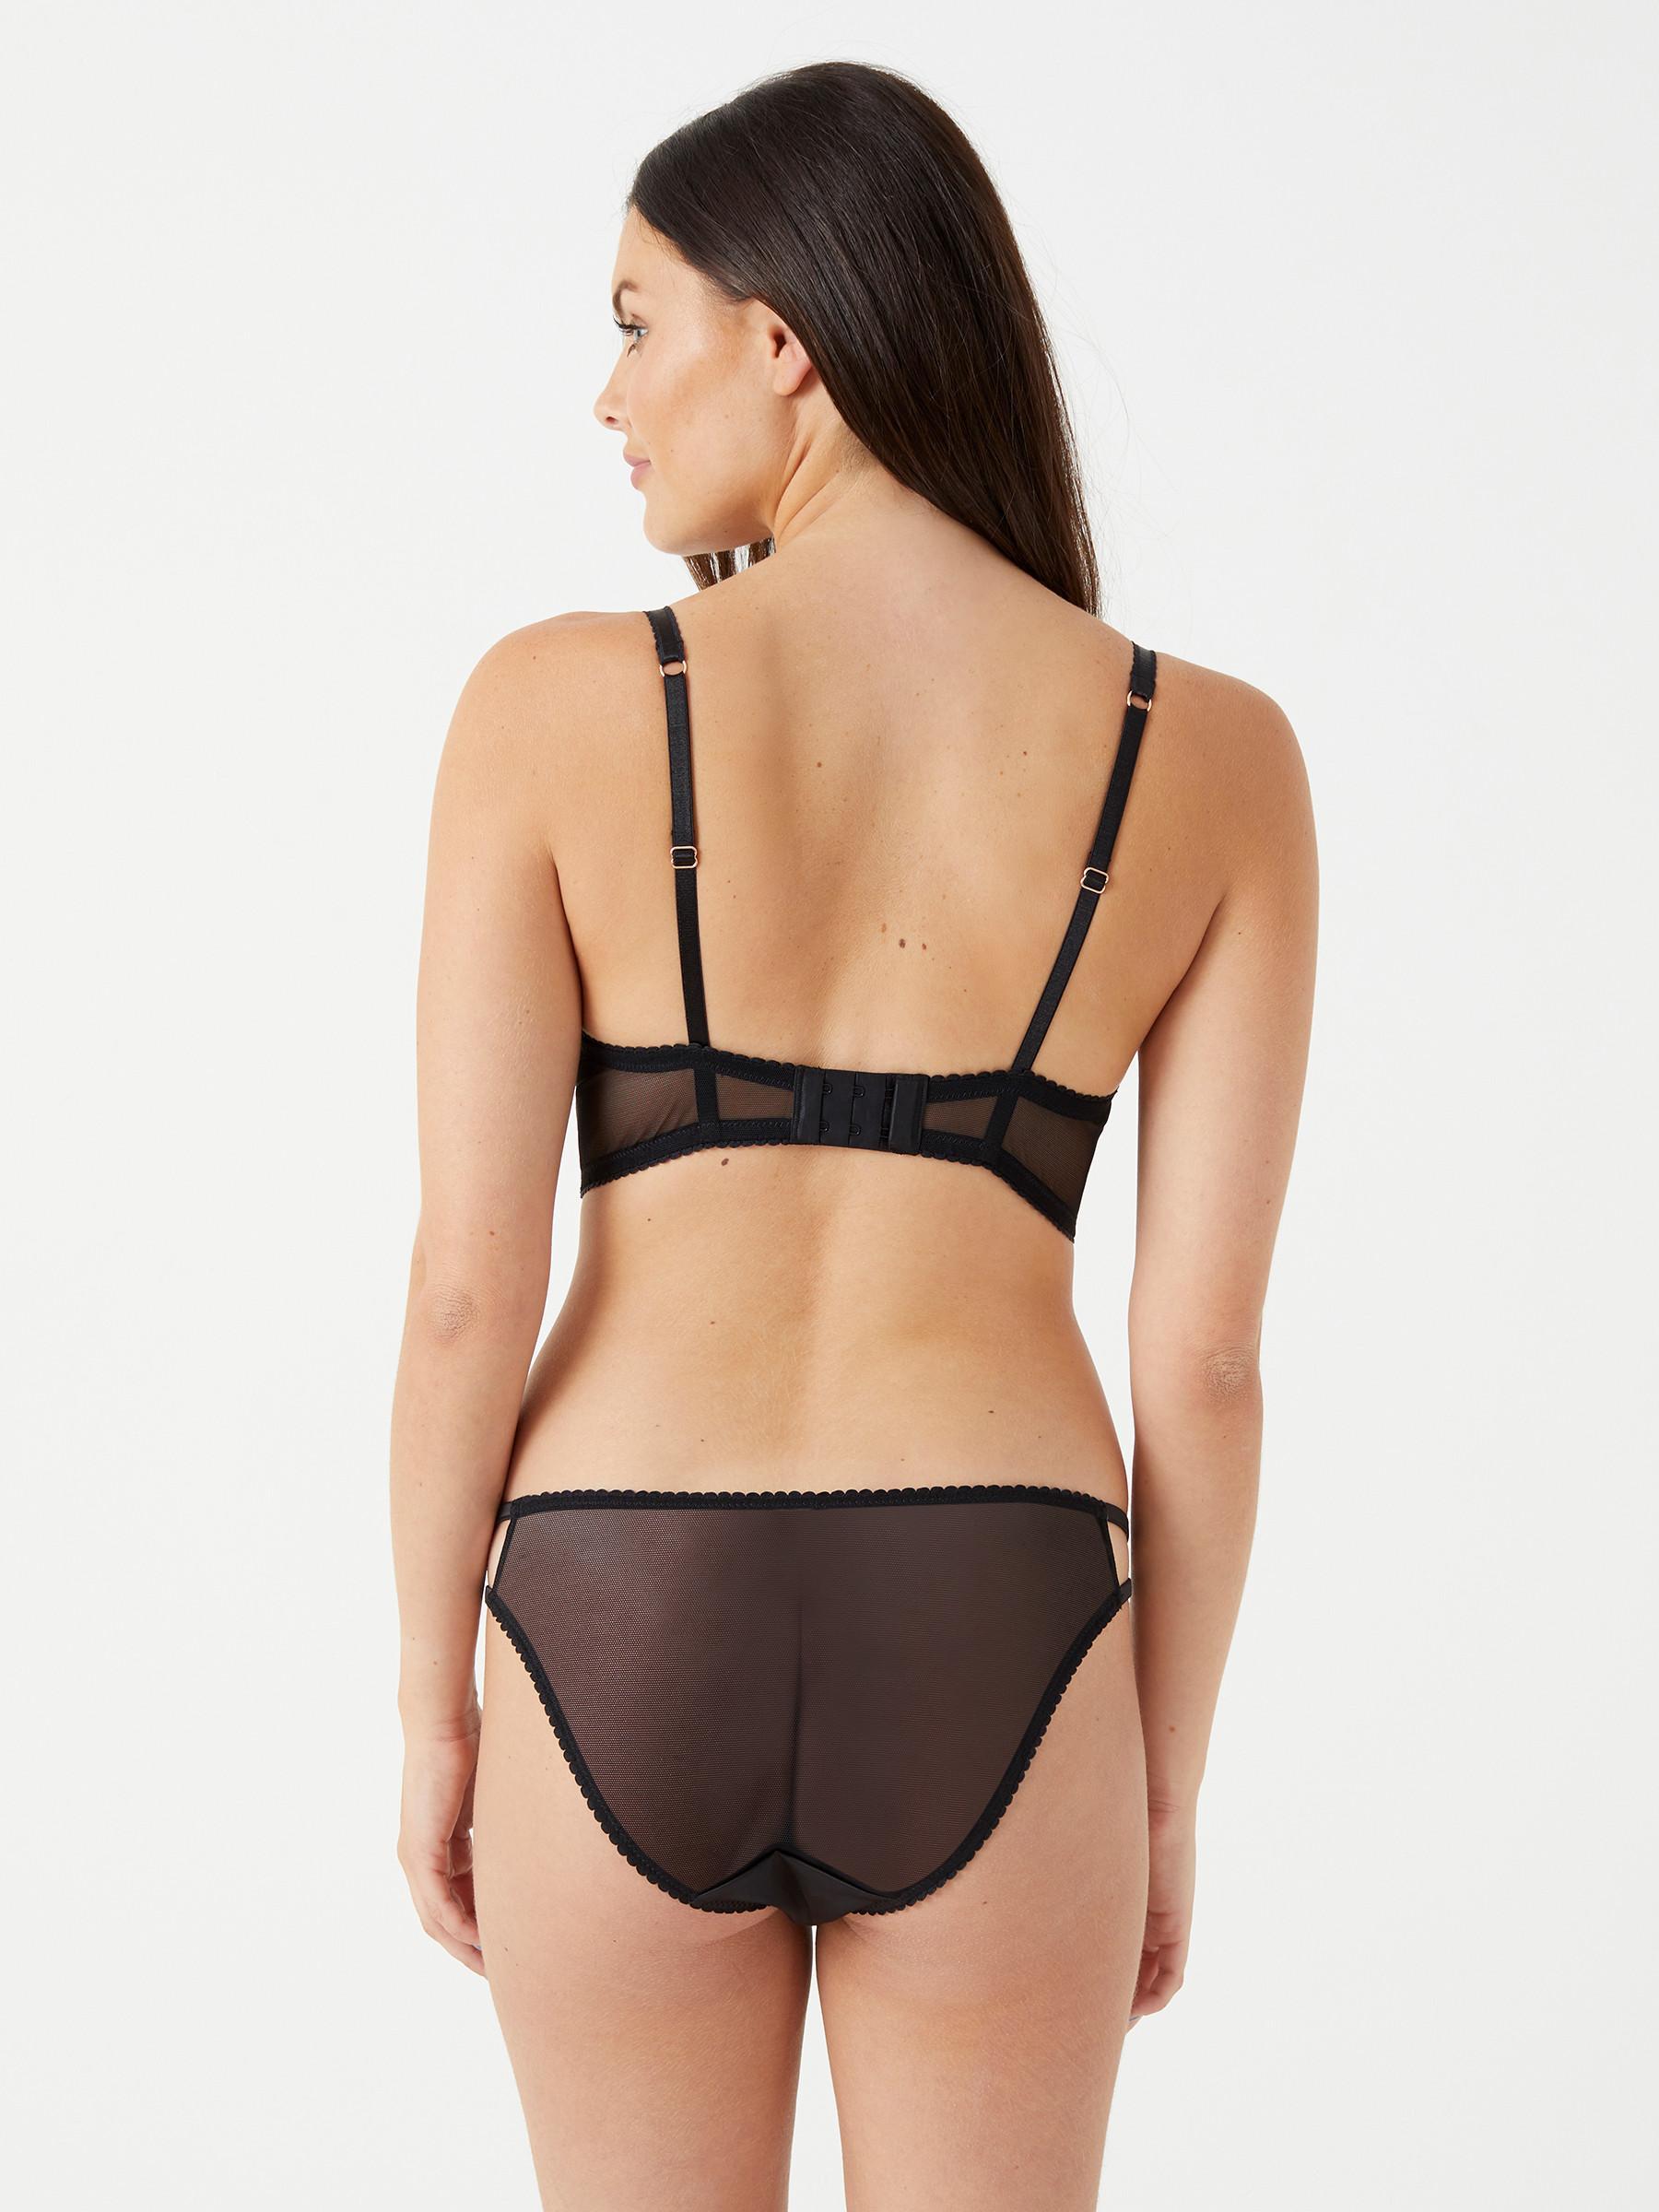 a1fe667744a6b Lipsy Womens Amara Bra Floral Lace Longline Underwire Sexy Lingerie  Underwear